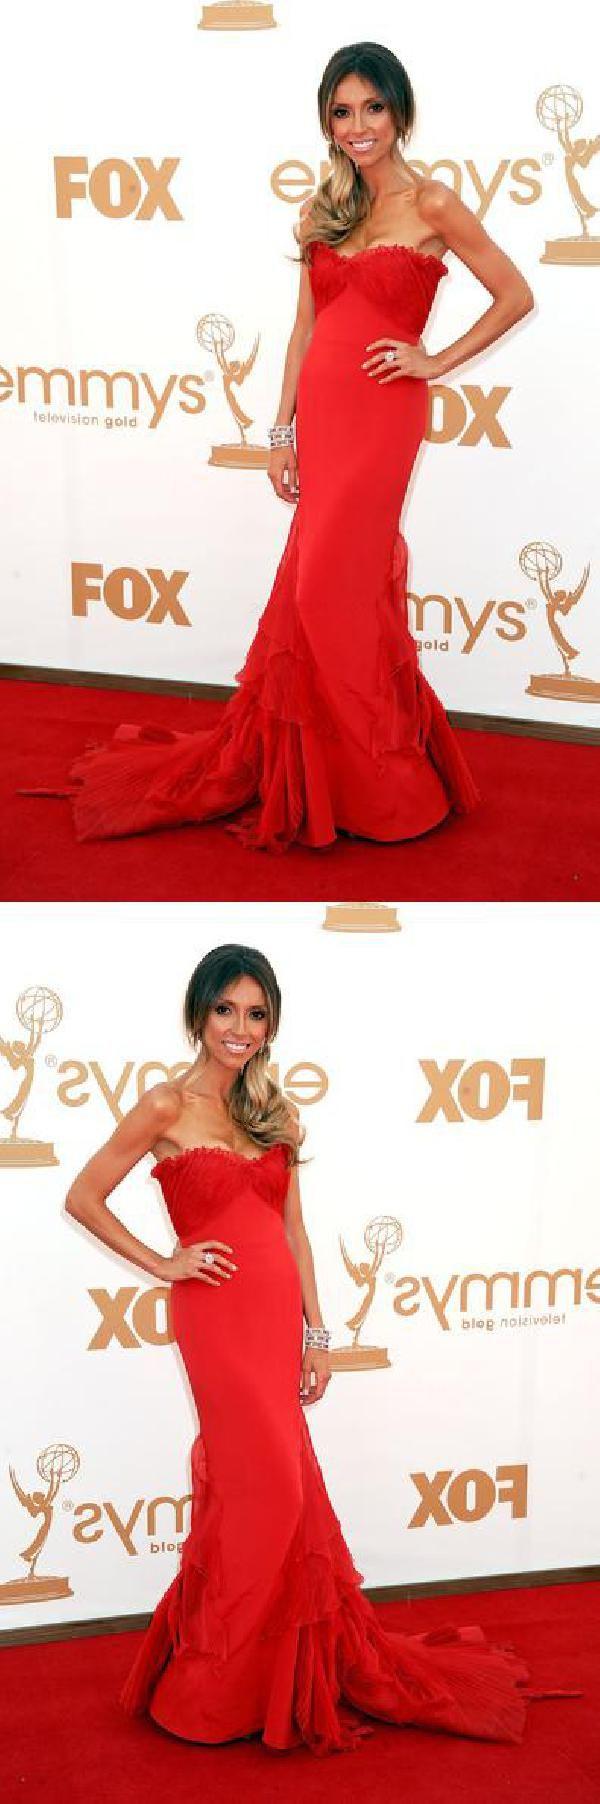 Custom dress dress red supe prom dresses pinterest